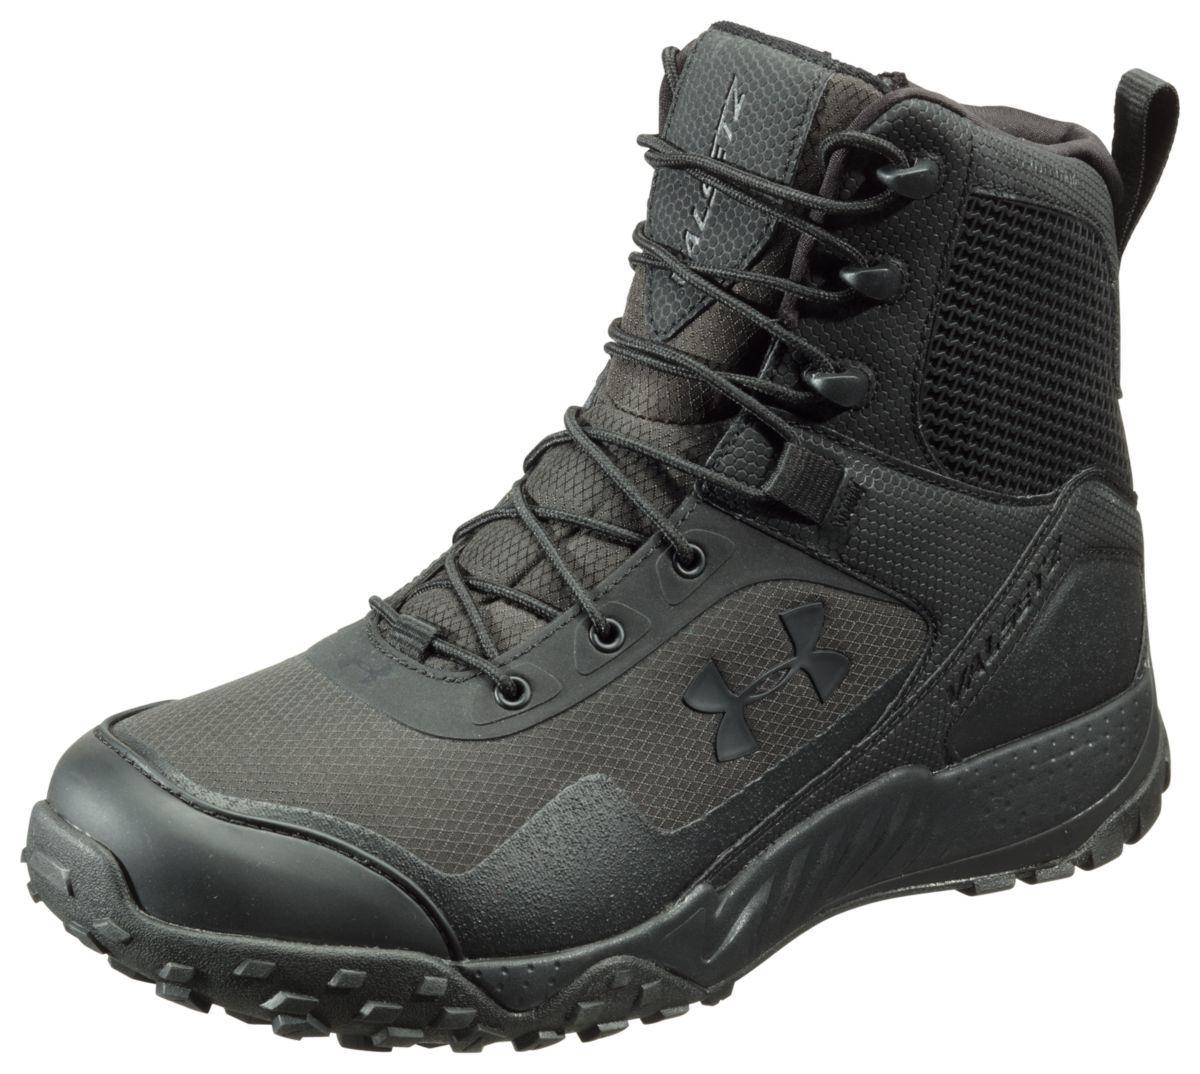 Under Armour® Men's Valsetz RTS 1.5 Side-Zip Tactical Duty Boots